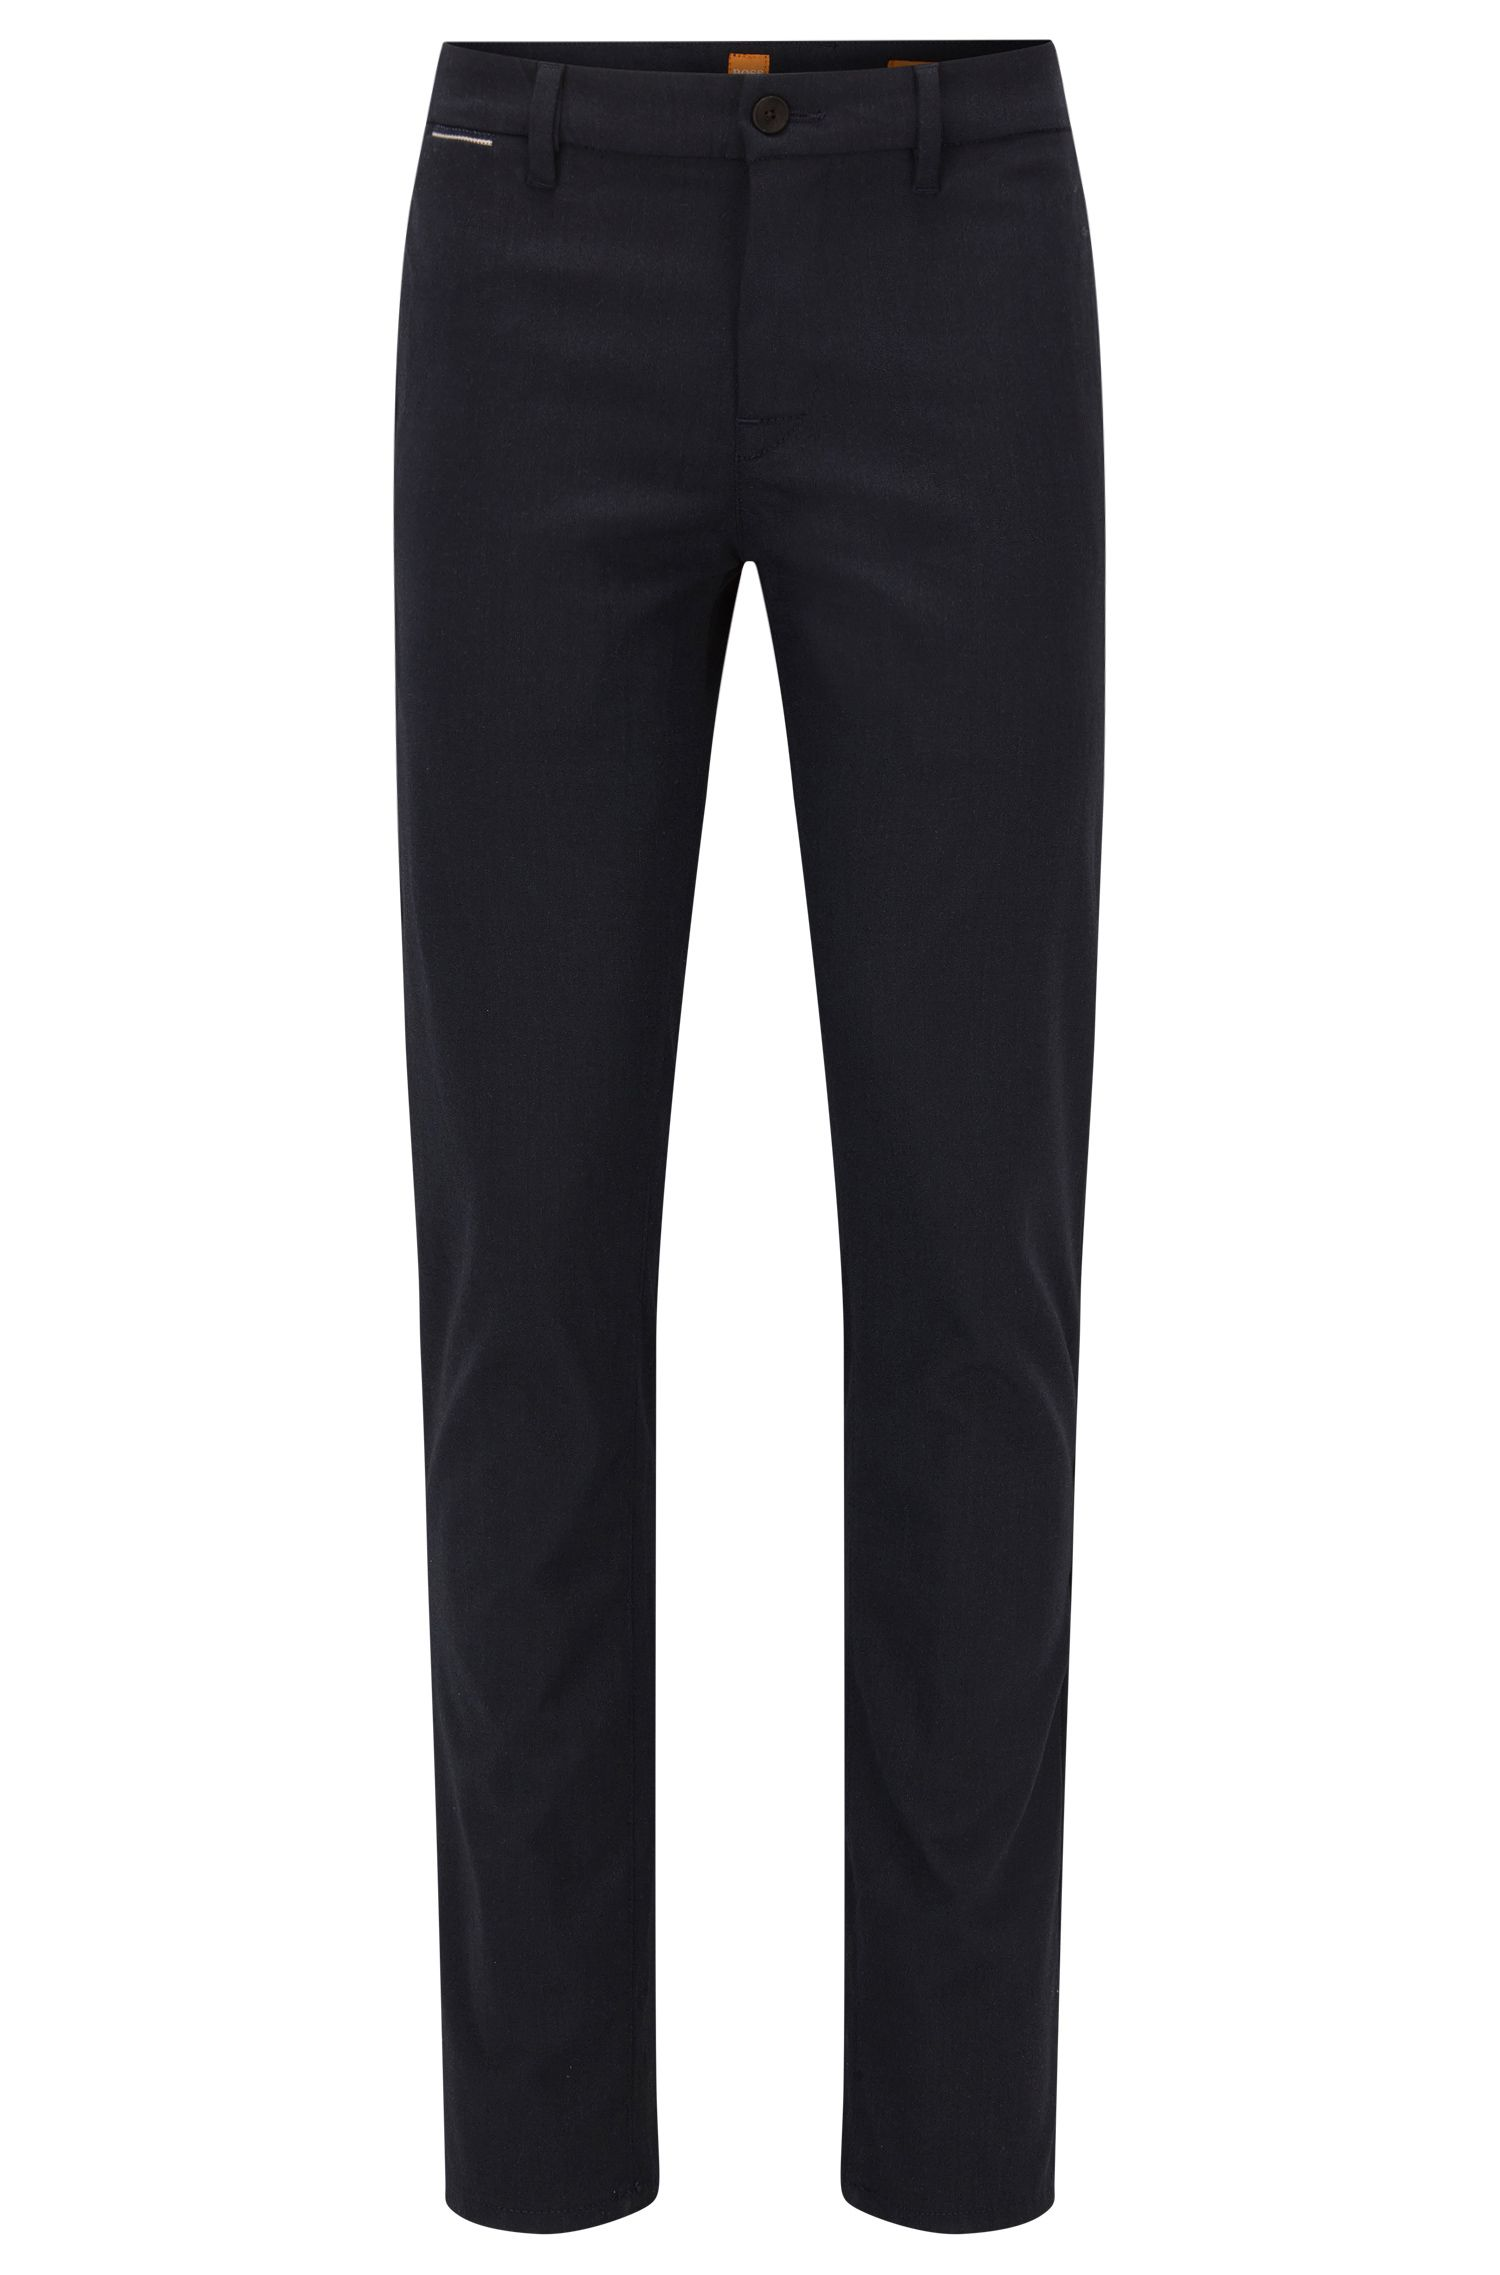 Slim-fit broek van een melange Oxfordstof